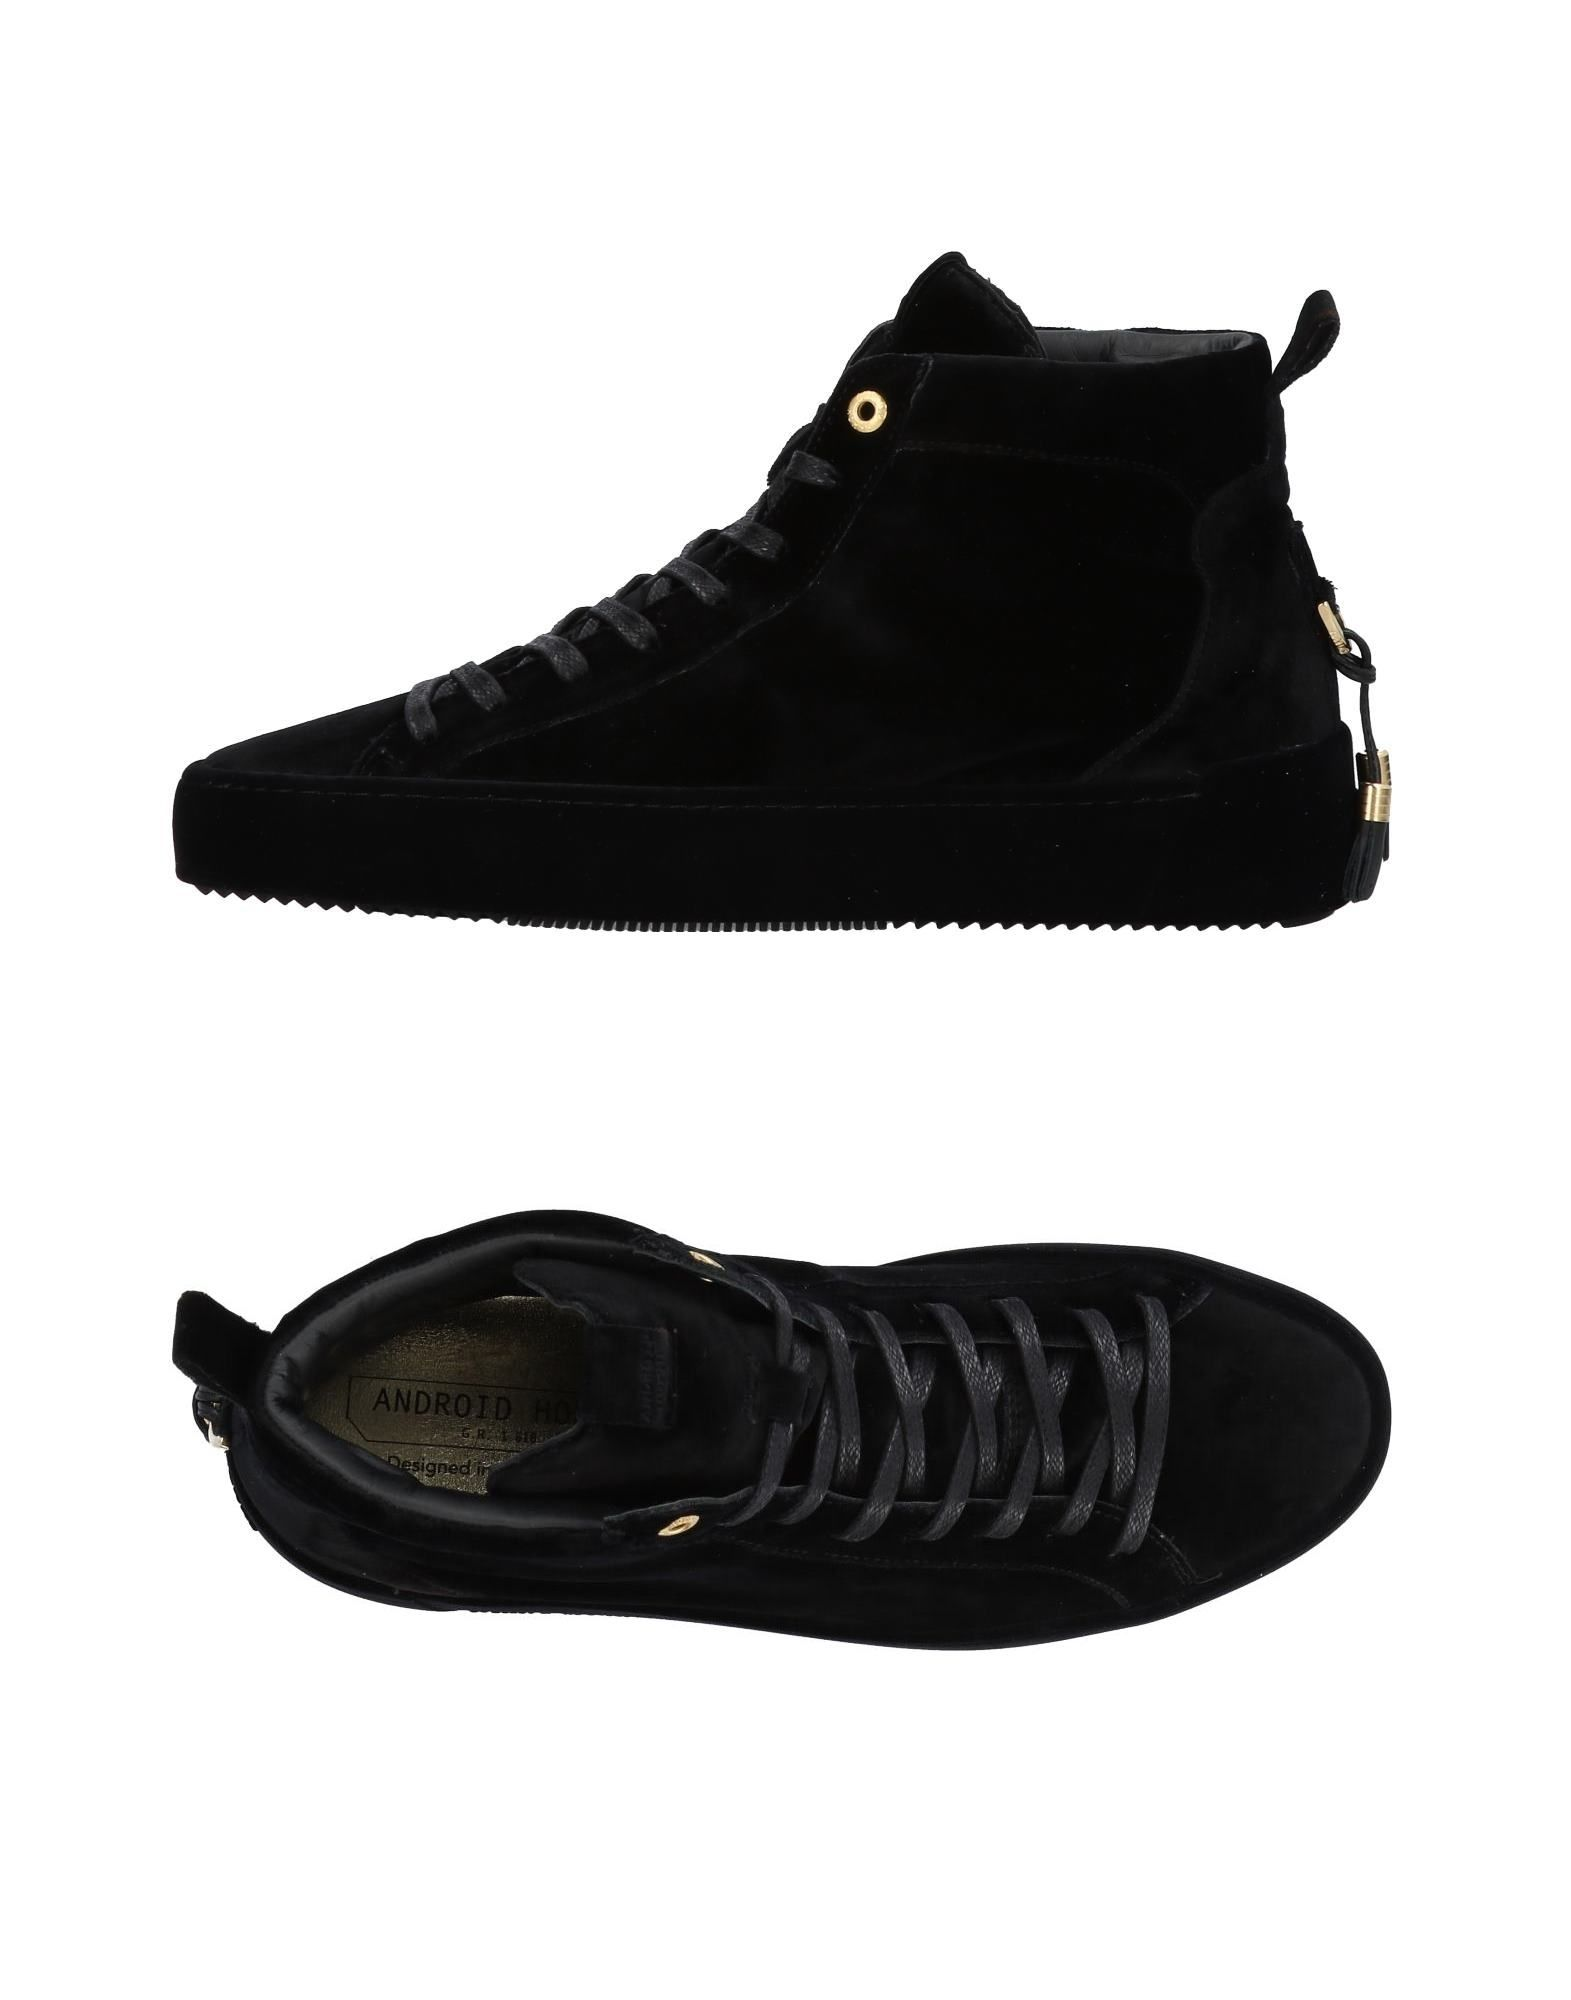 Android Homme Sneakers Herren  11433629TU Gute Qualität beliebte Schuhe